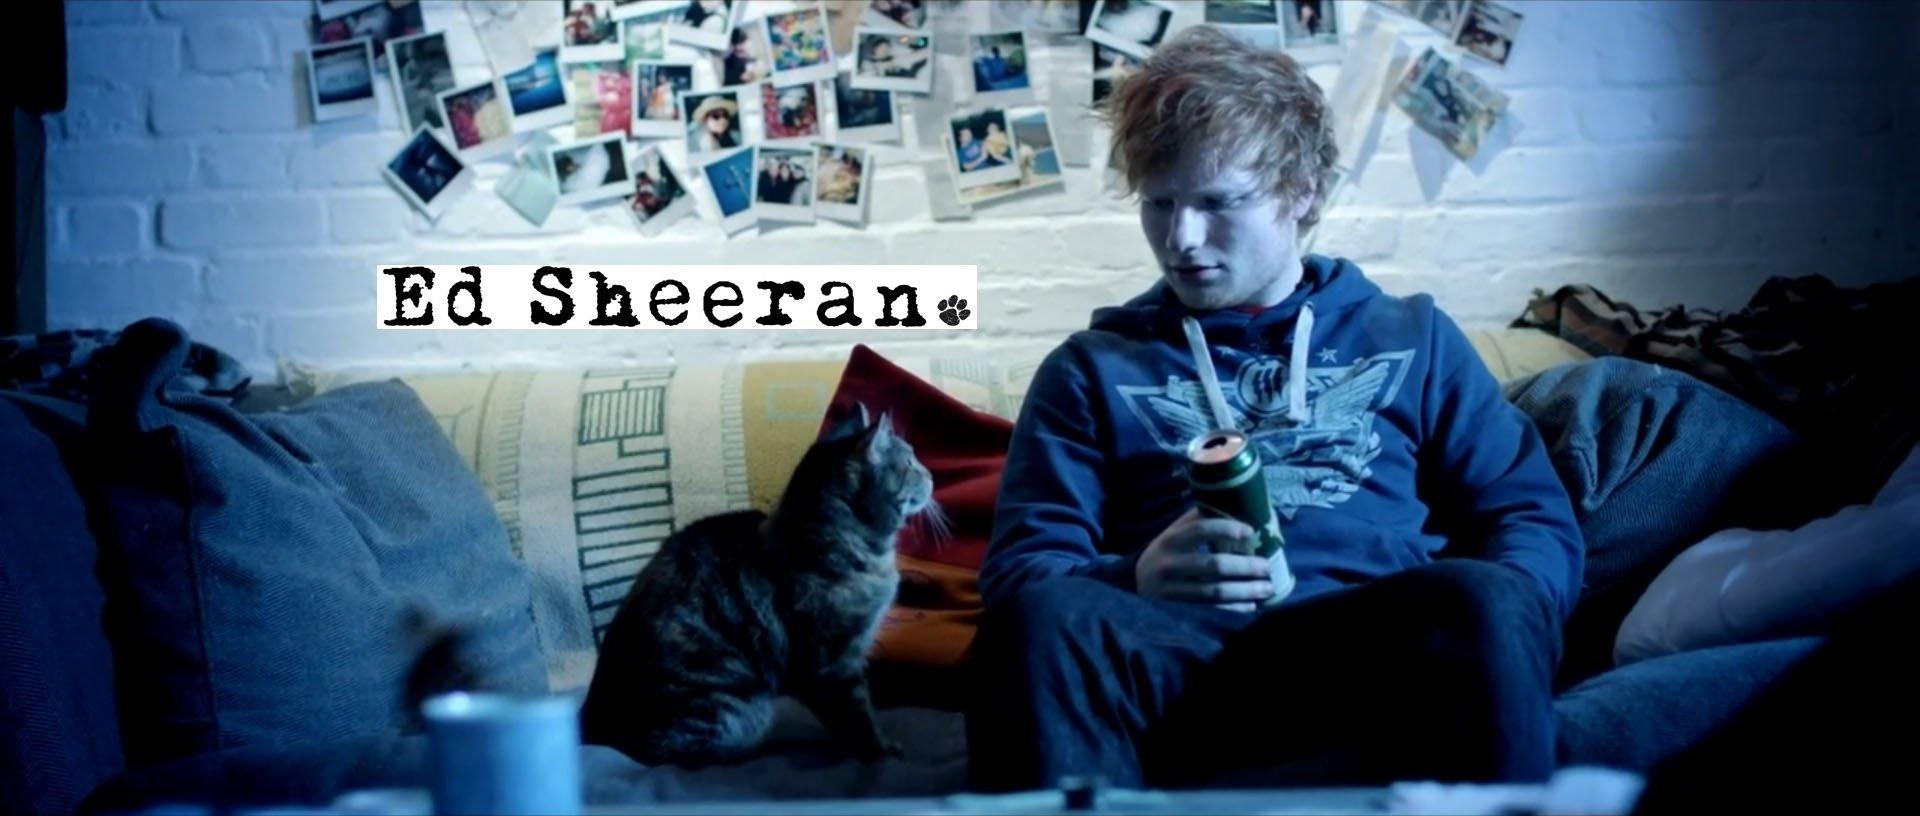 Ed Sheeran Lyrics, Music, News And Biography